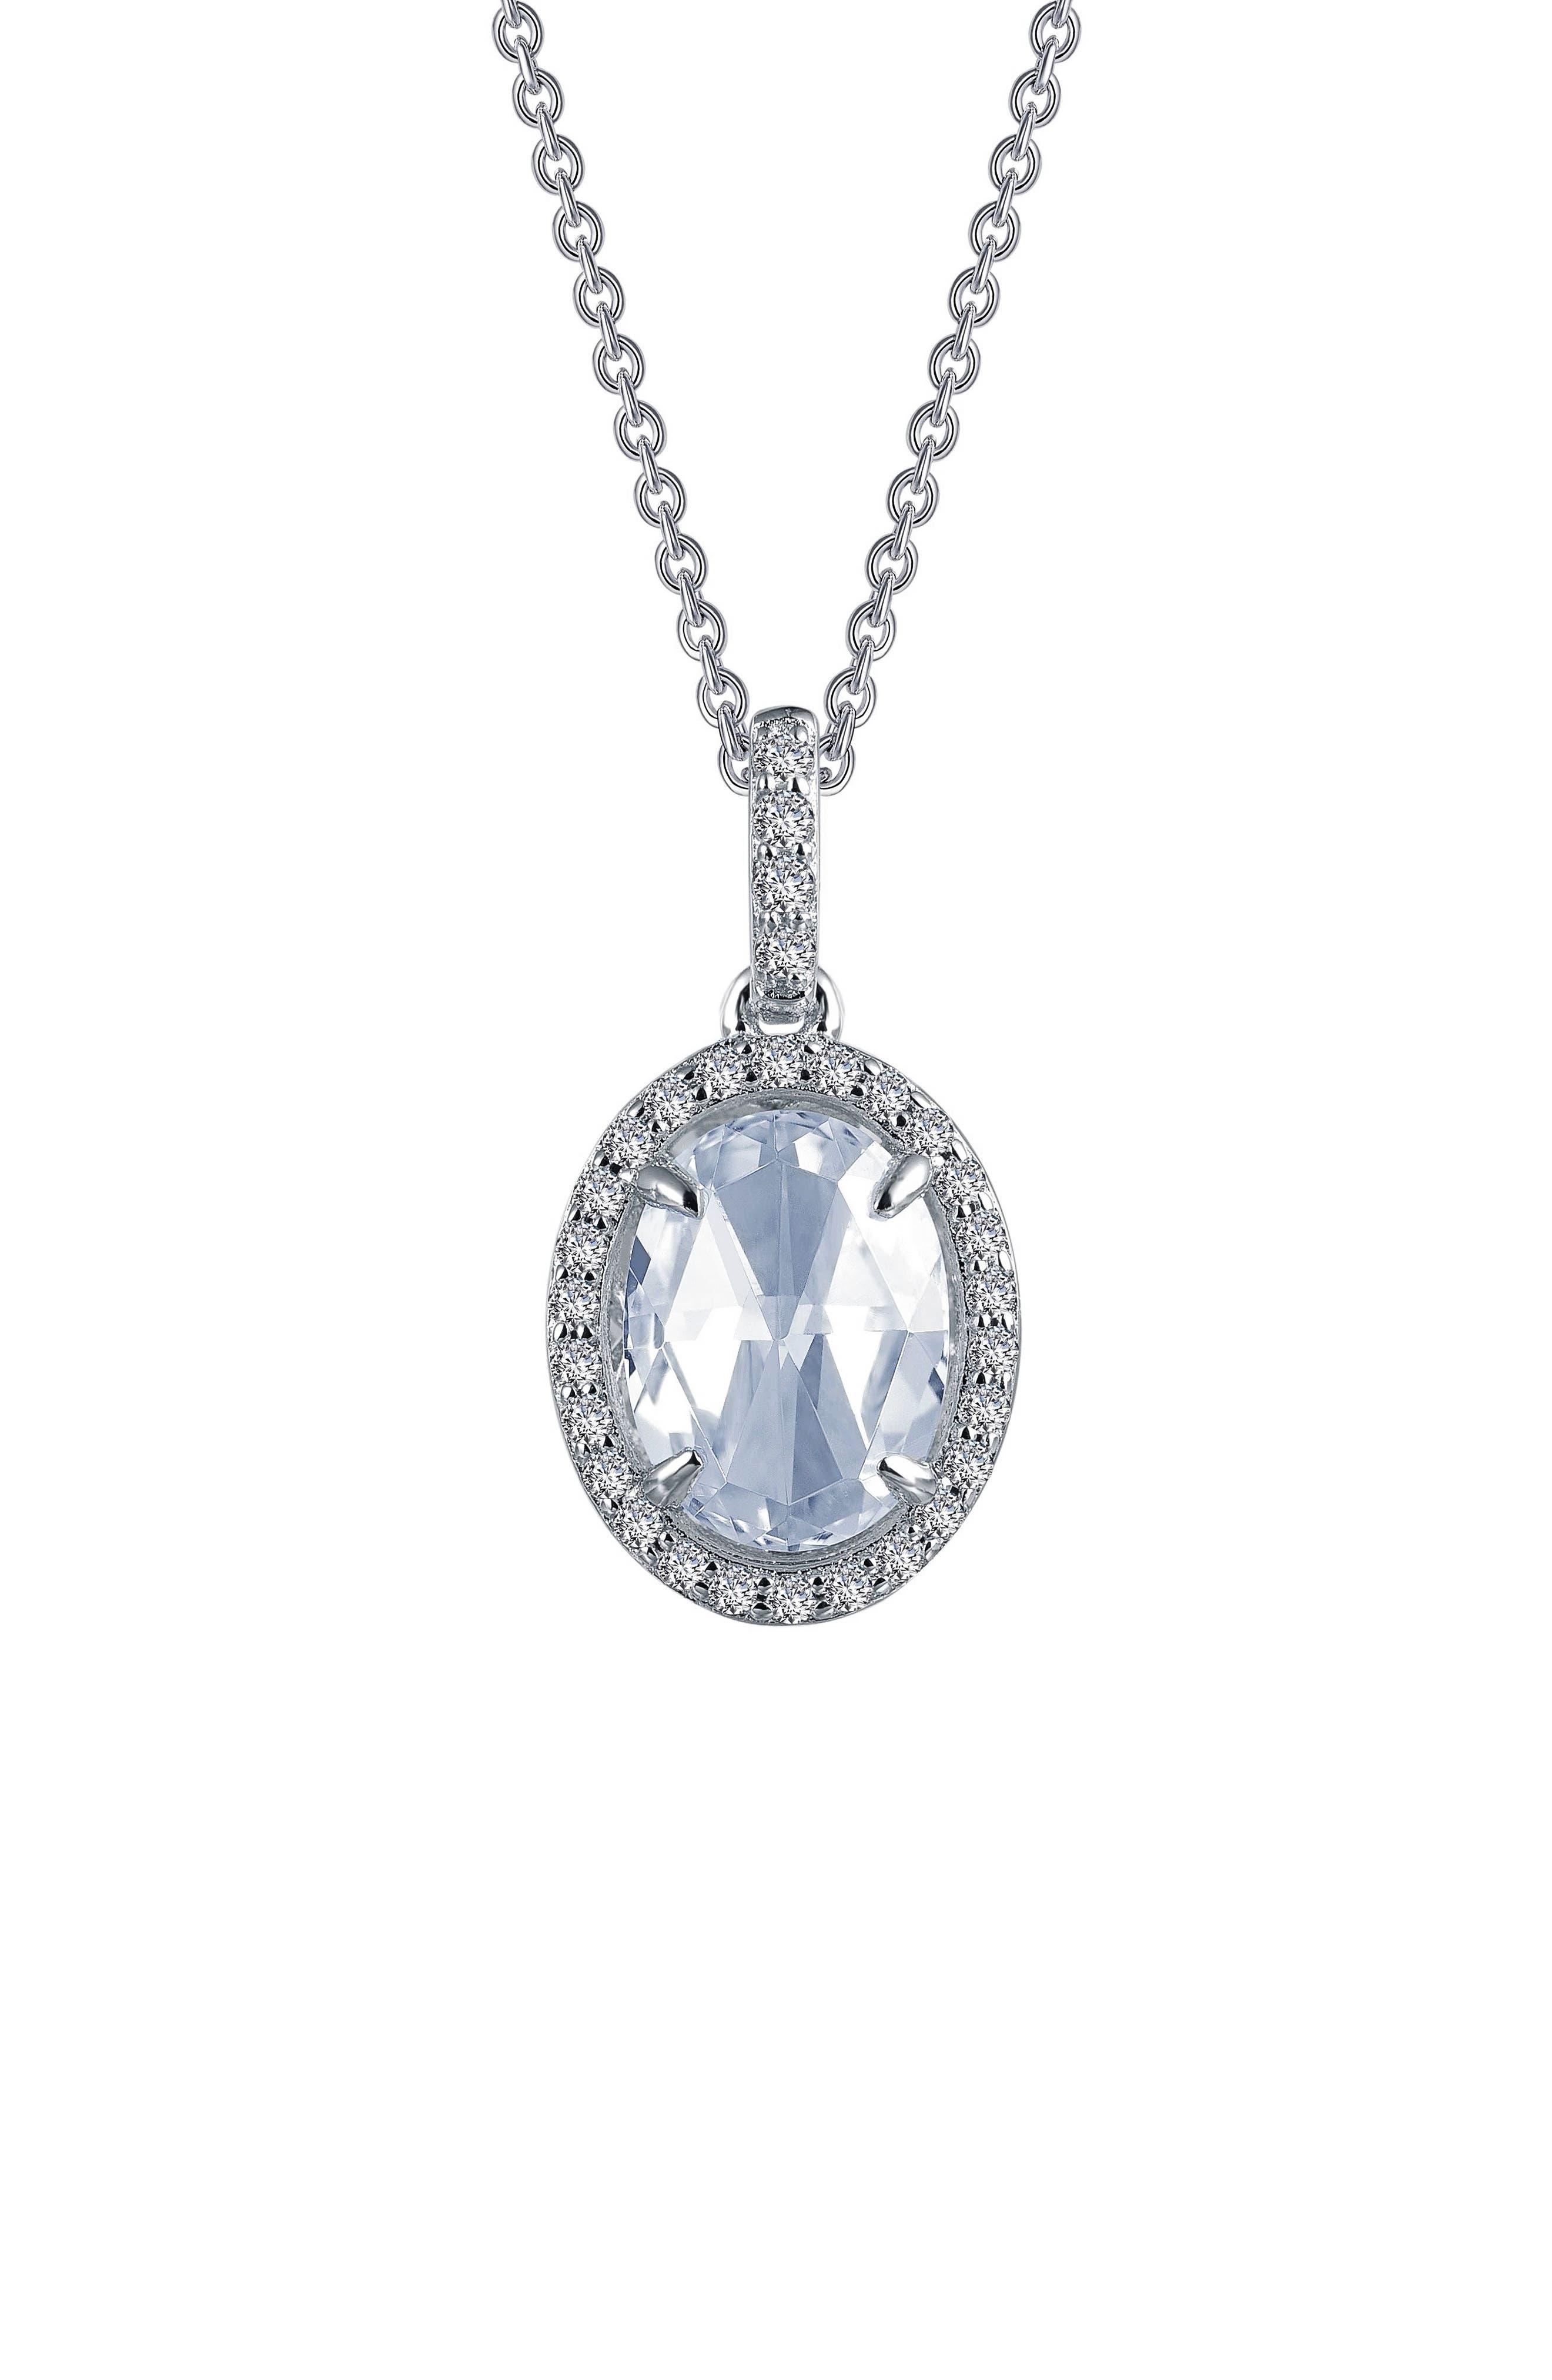 Rose Cut Simulated Diamond Pendant Necklace,                             Main thumbnail 1, color,                             040